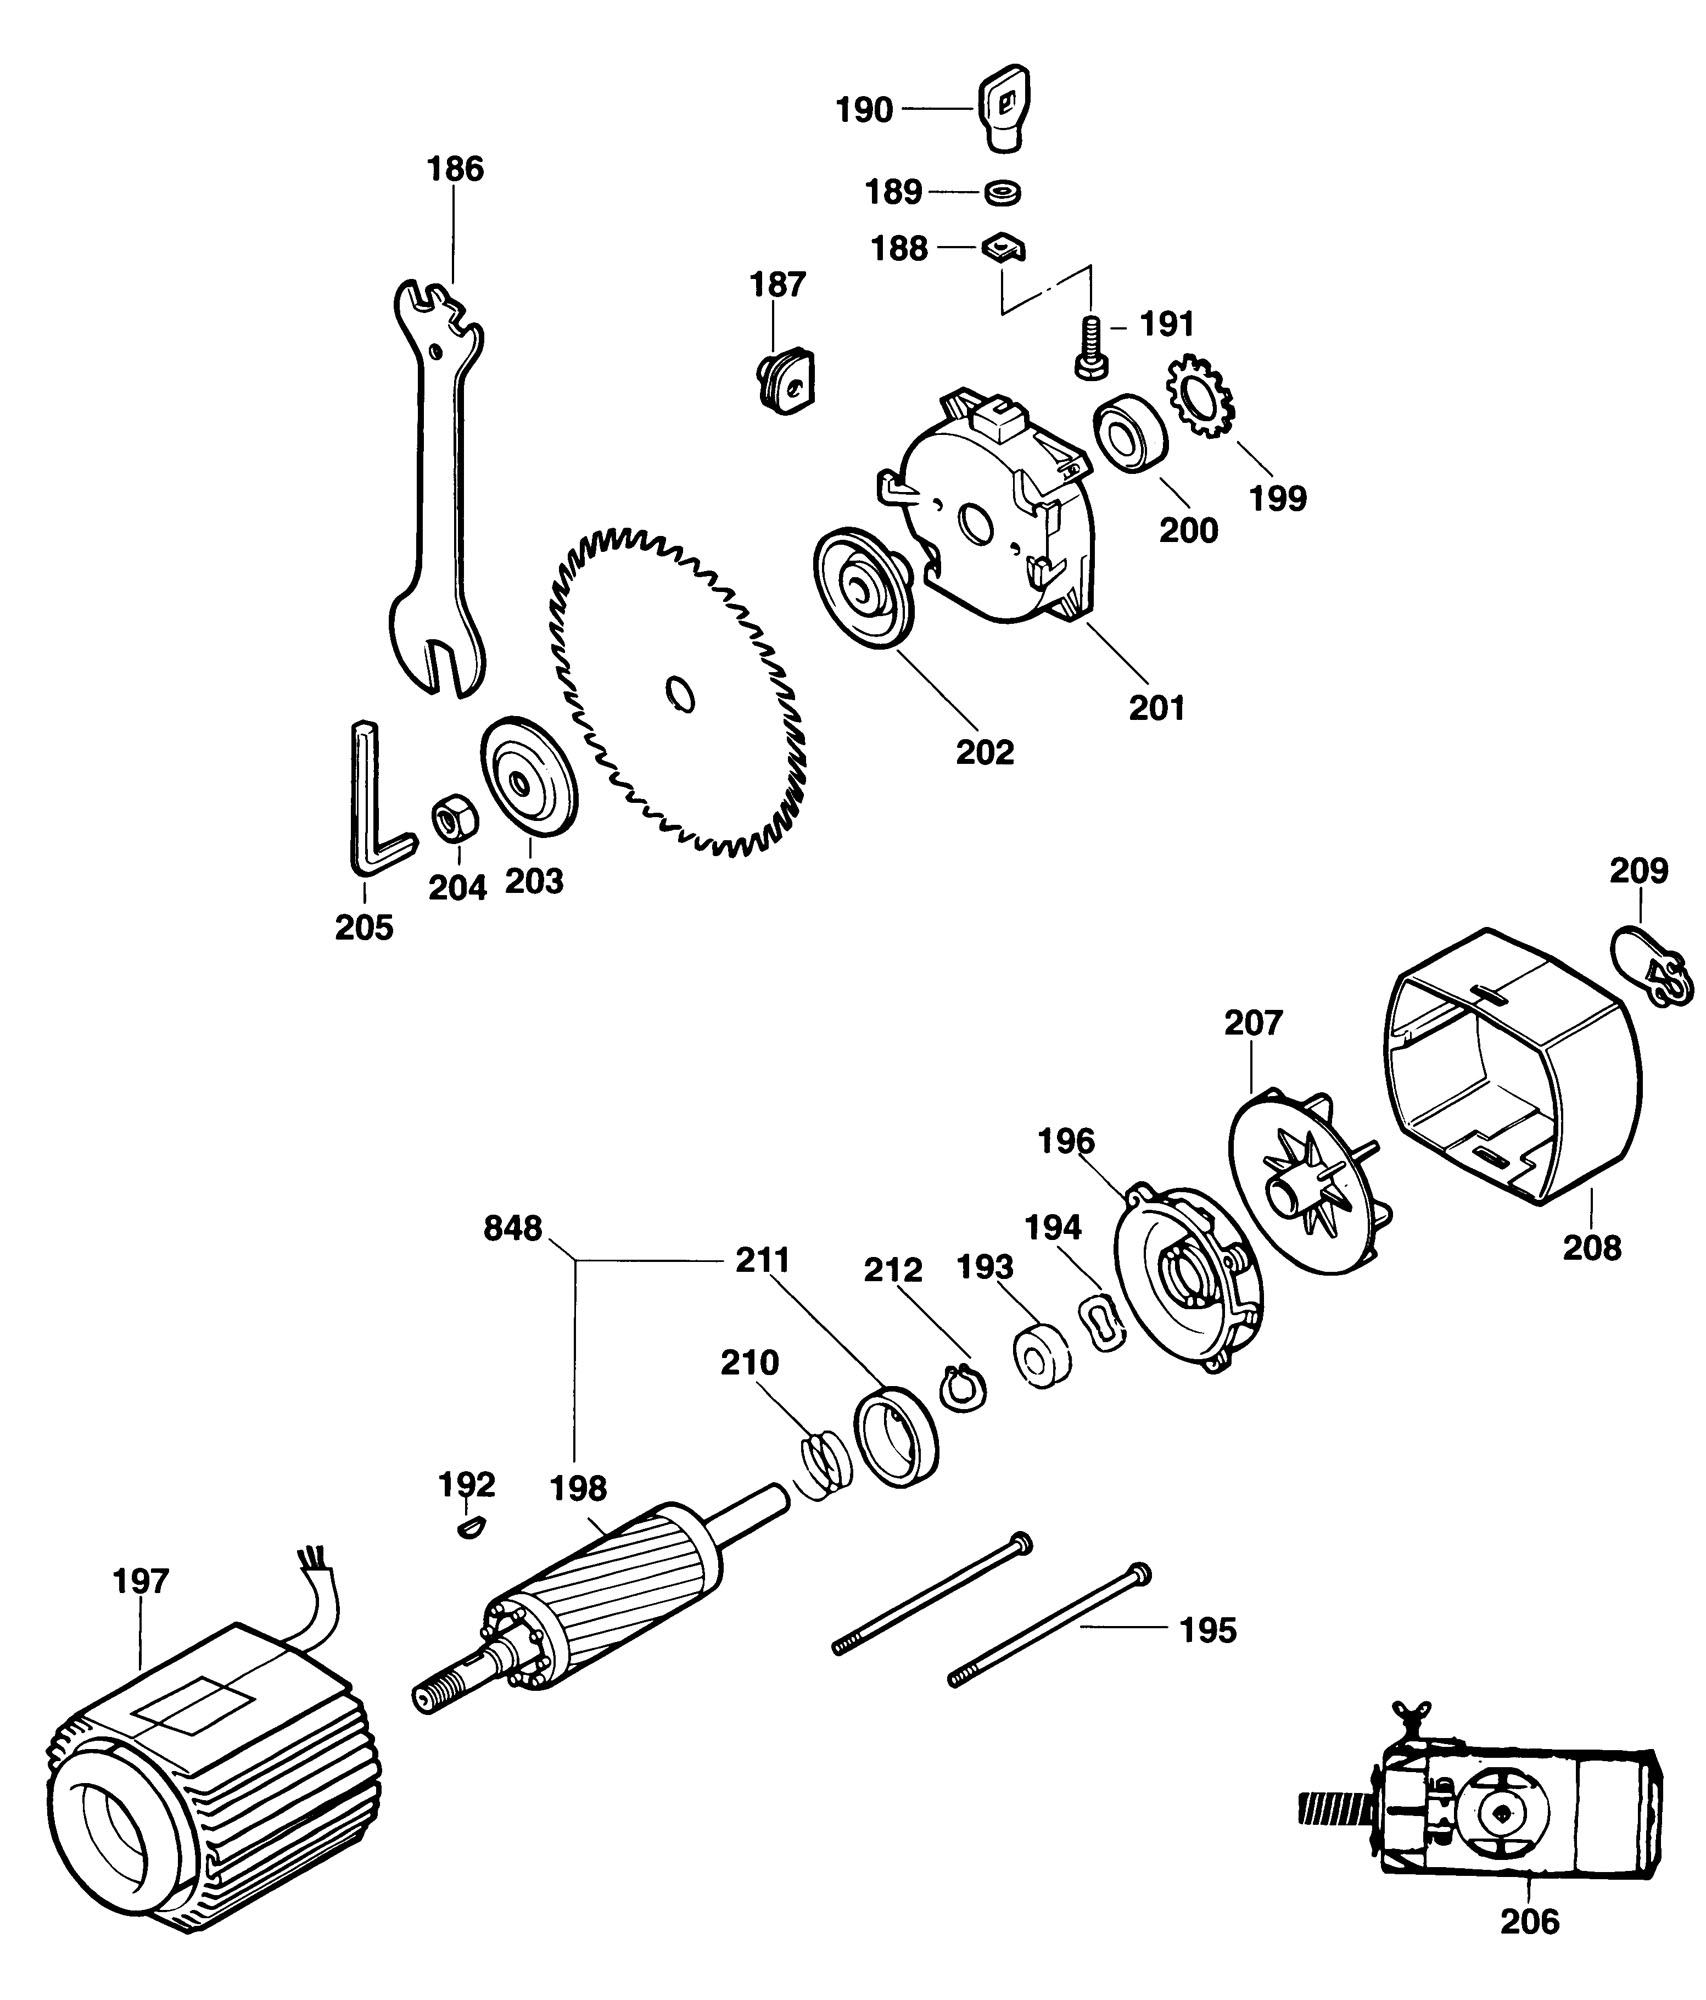 Spares for Dewalt Dw720 Radial Arm Saw (type 1) SPARE